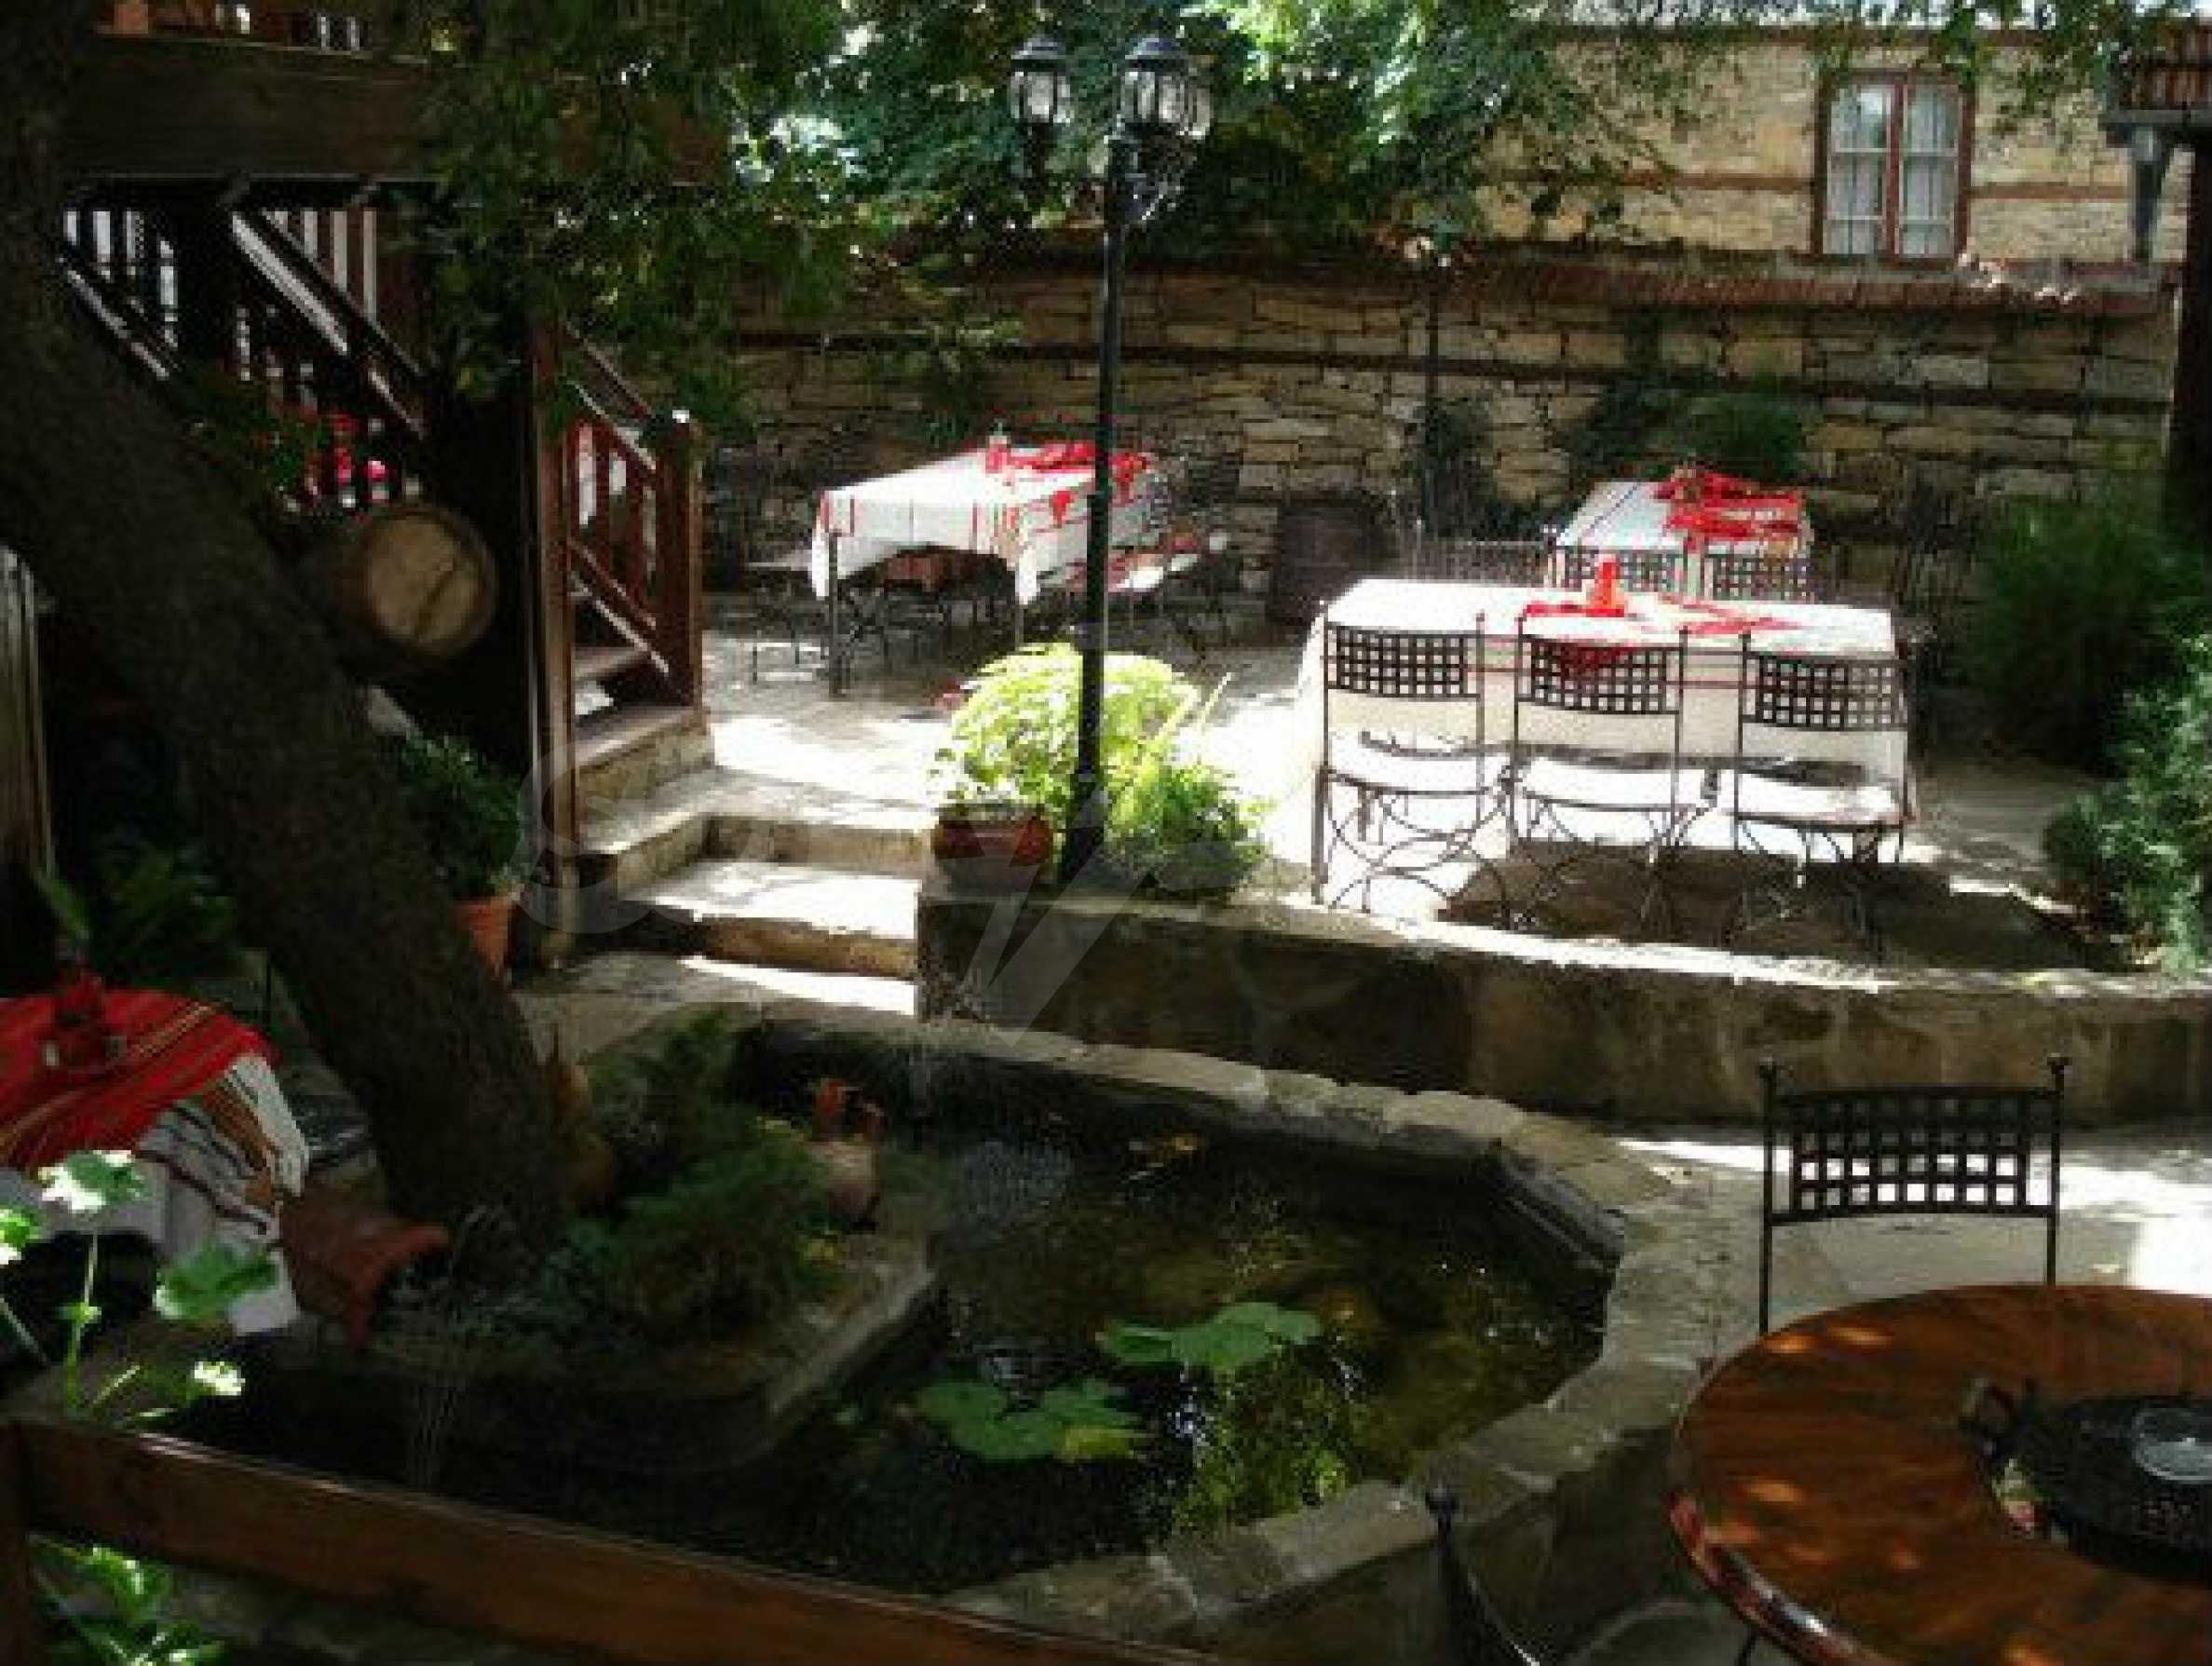 Hotelanlage mit Restaurant am Ufer des Flusses Osam in Lovech 62